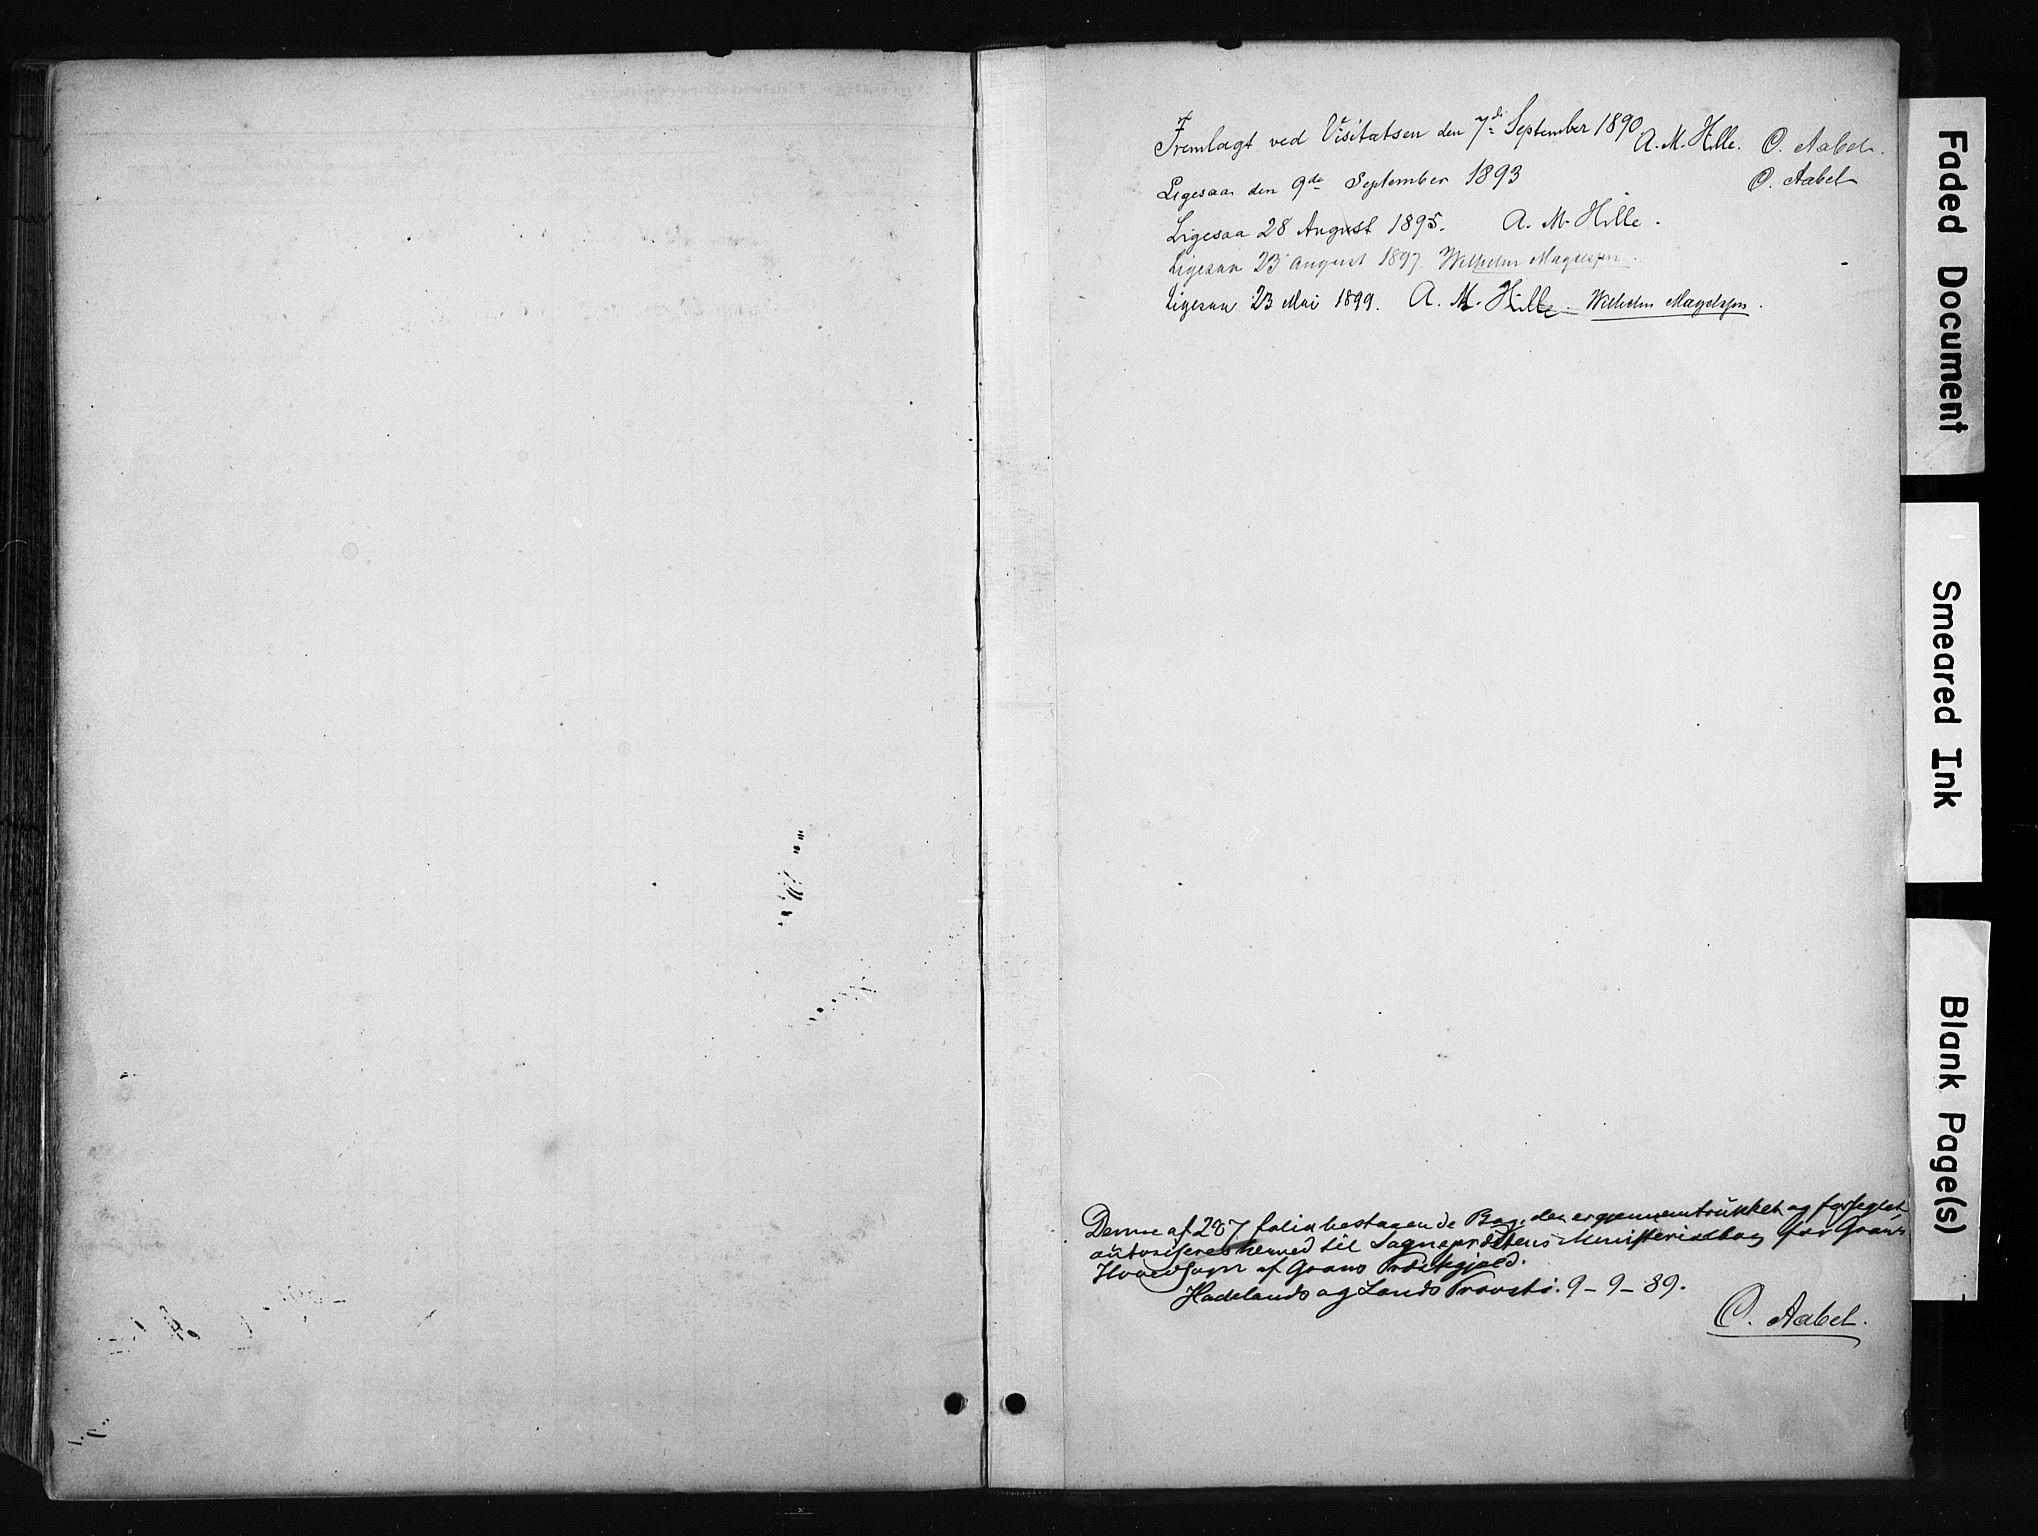 SAH, Gran prestekontor, Ministerialbok nr. 17, 1889-1897, s. 267